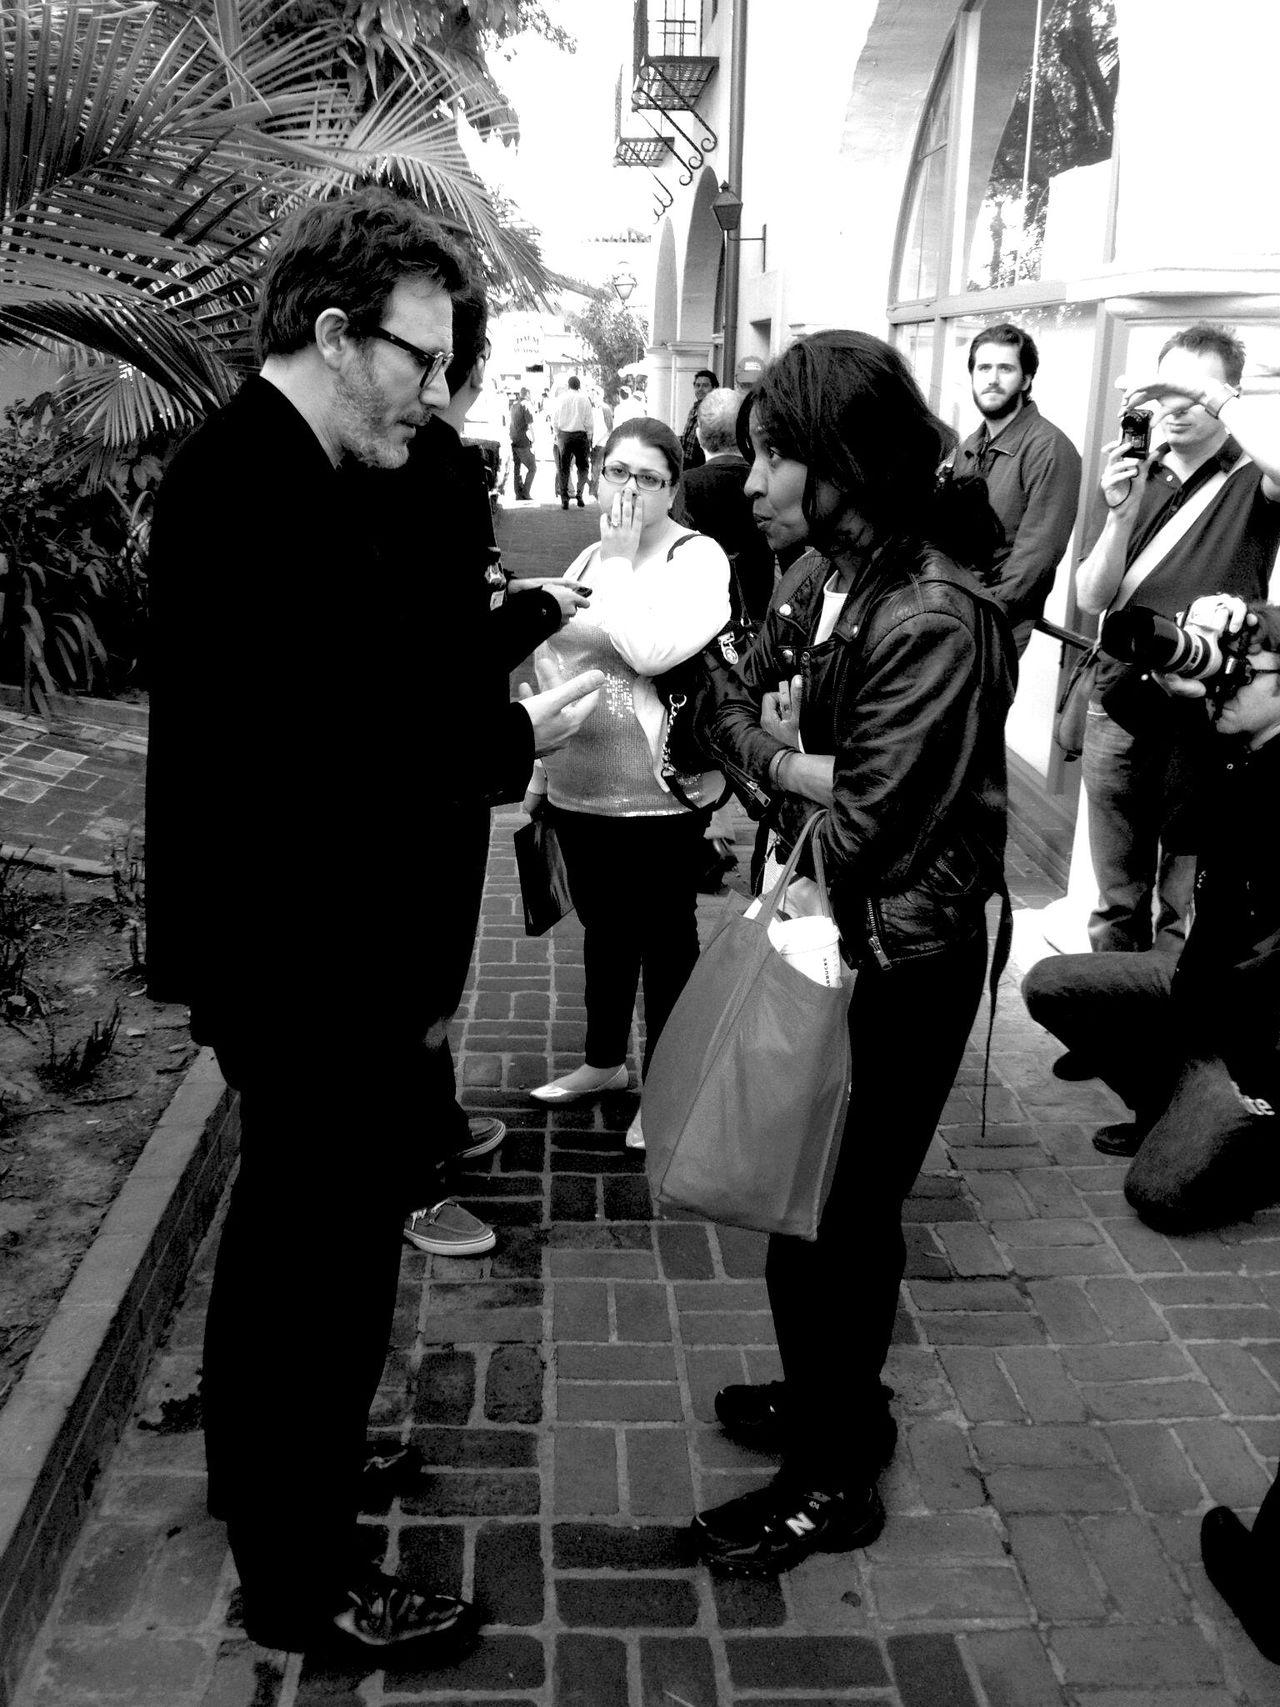 QVHoughPhoto Santabarbara California Sbiff Filmfestival Theartist Blackandwhite Michelhazanavicus Director IPhoneography IPhone4s